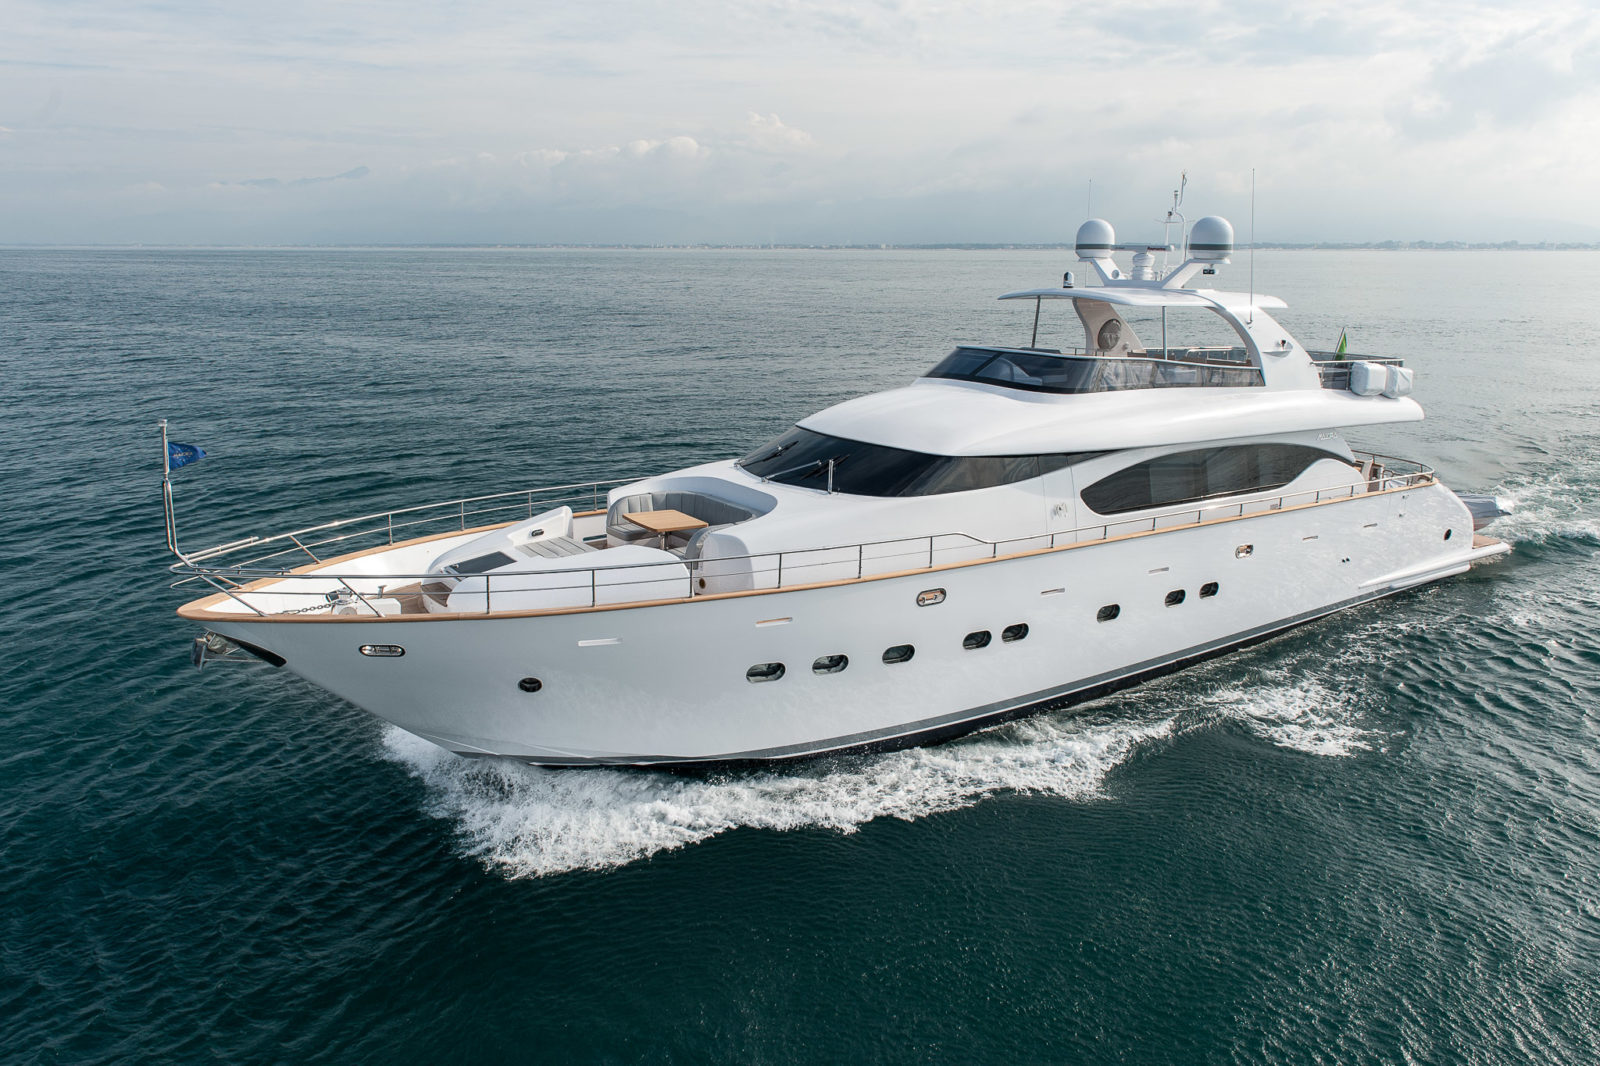 Luxury yacht for Charter | Miredo by Maiora